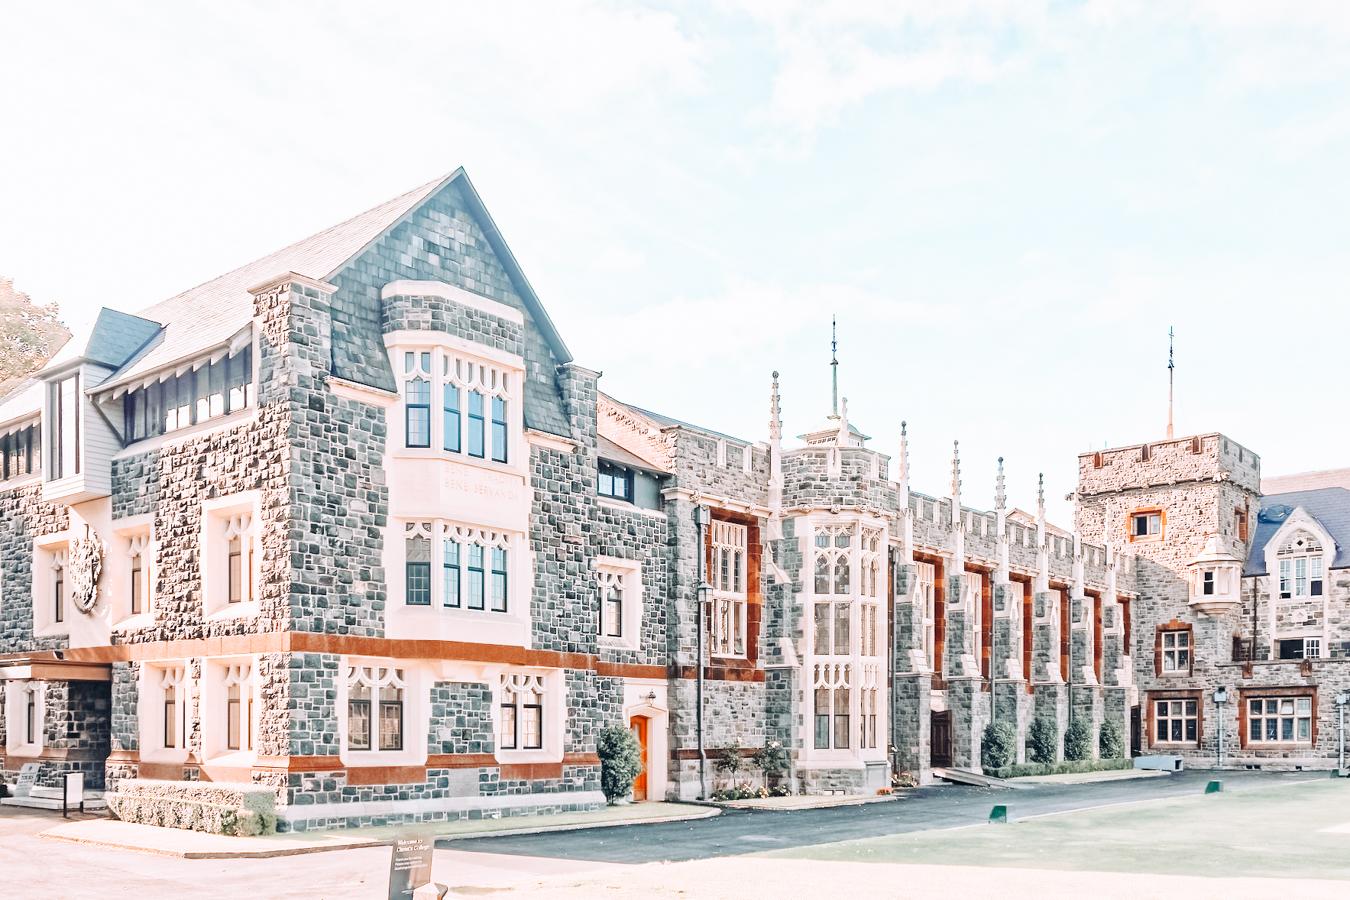 Building in Christchurch